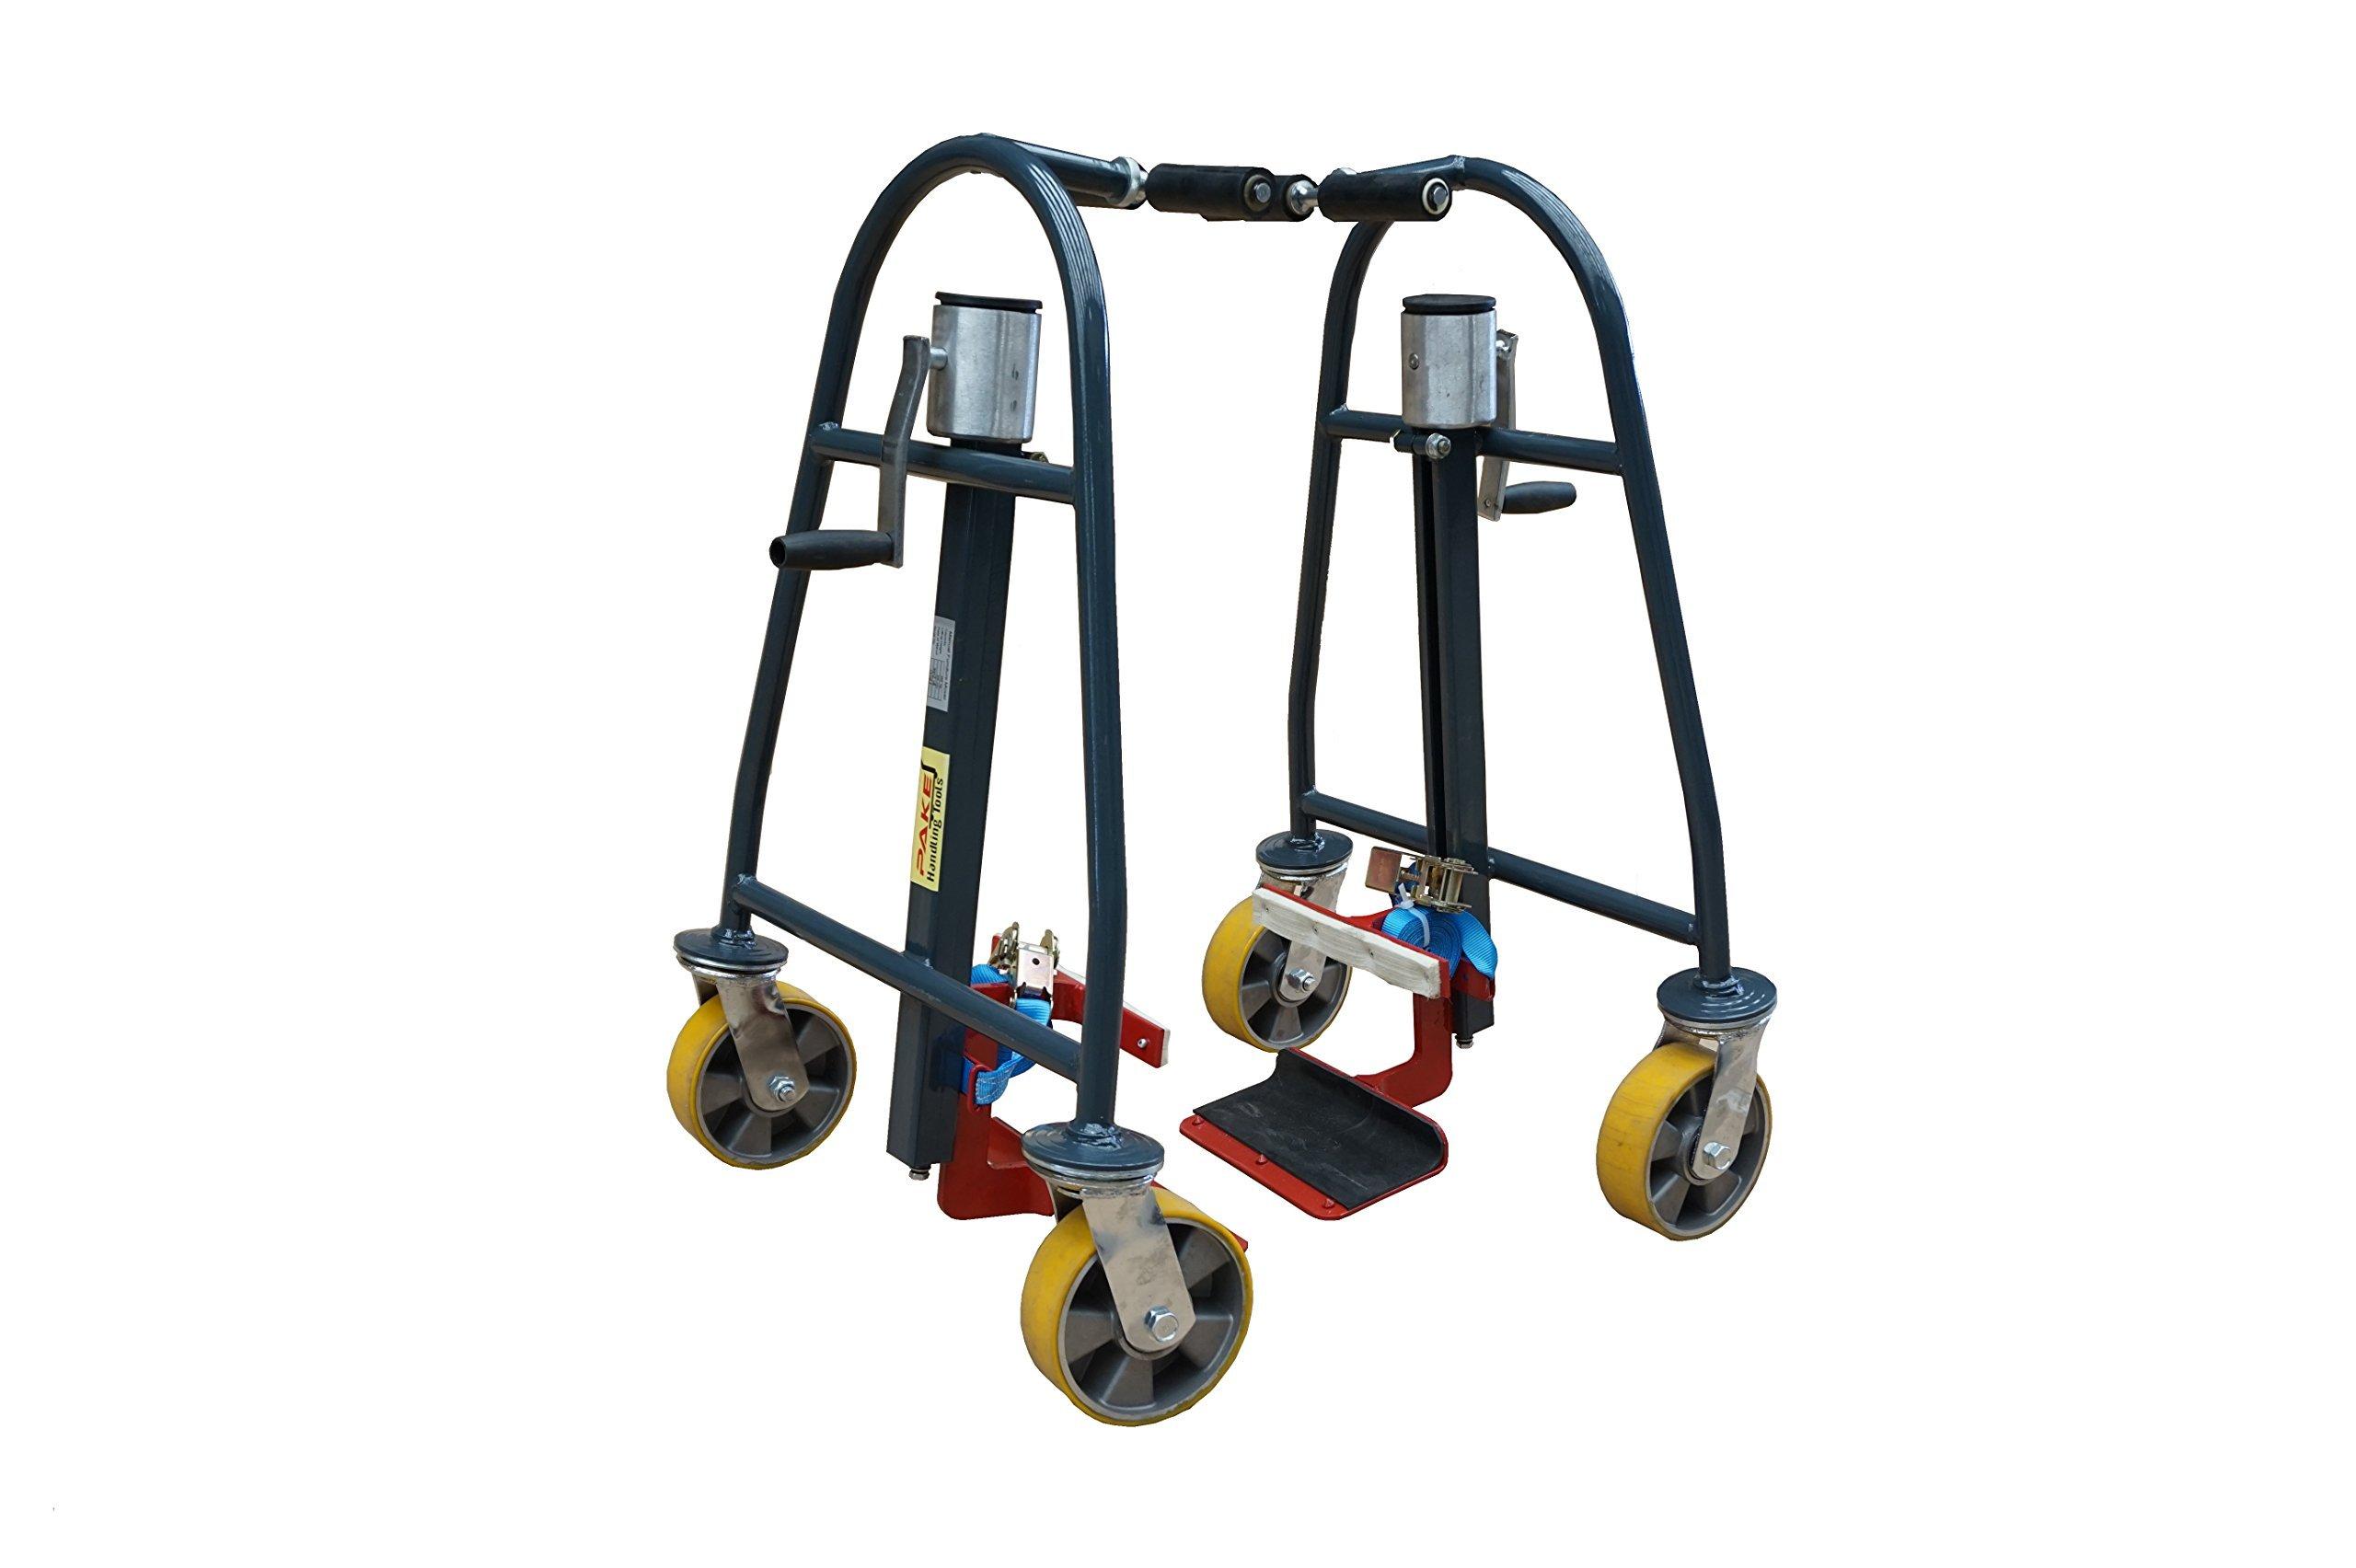 Pake Handling Tools - Manual Furniture Mover Set, 1320 lbs Capacity (Set of 2)